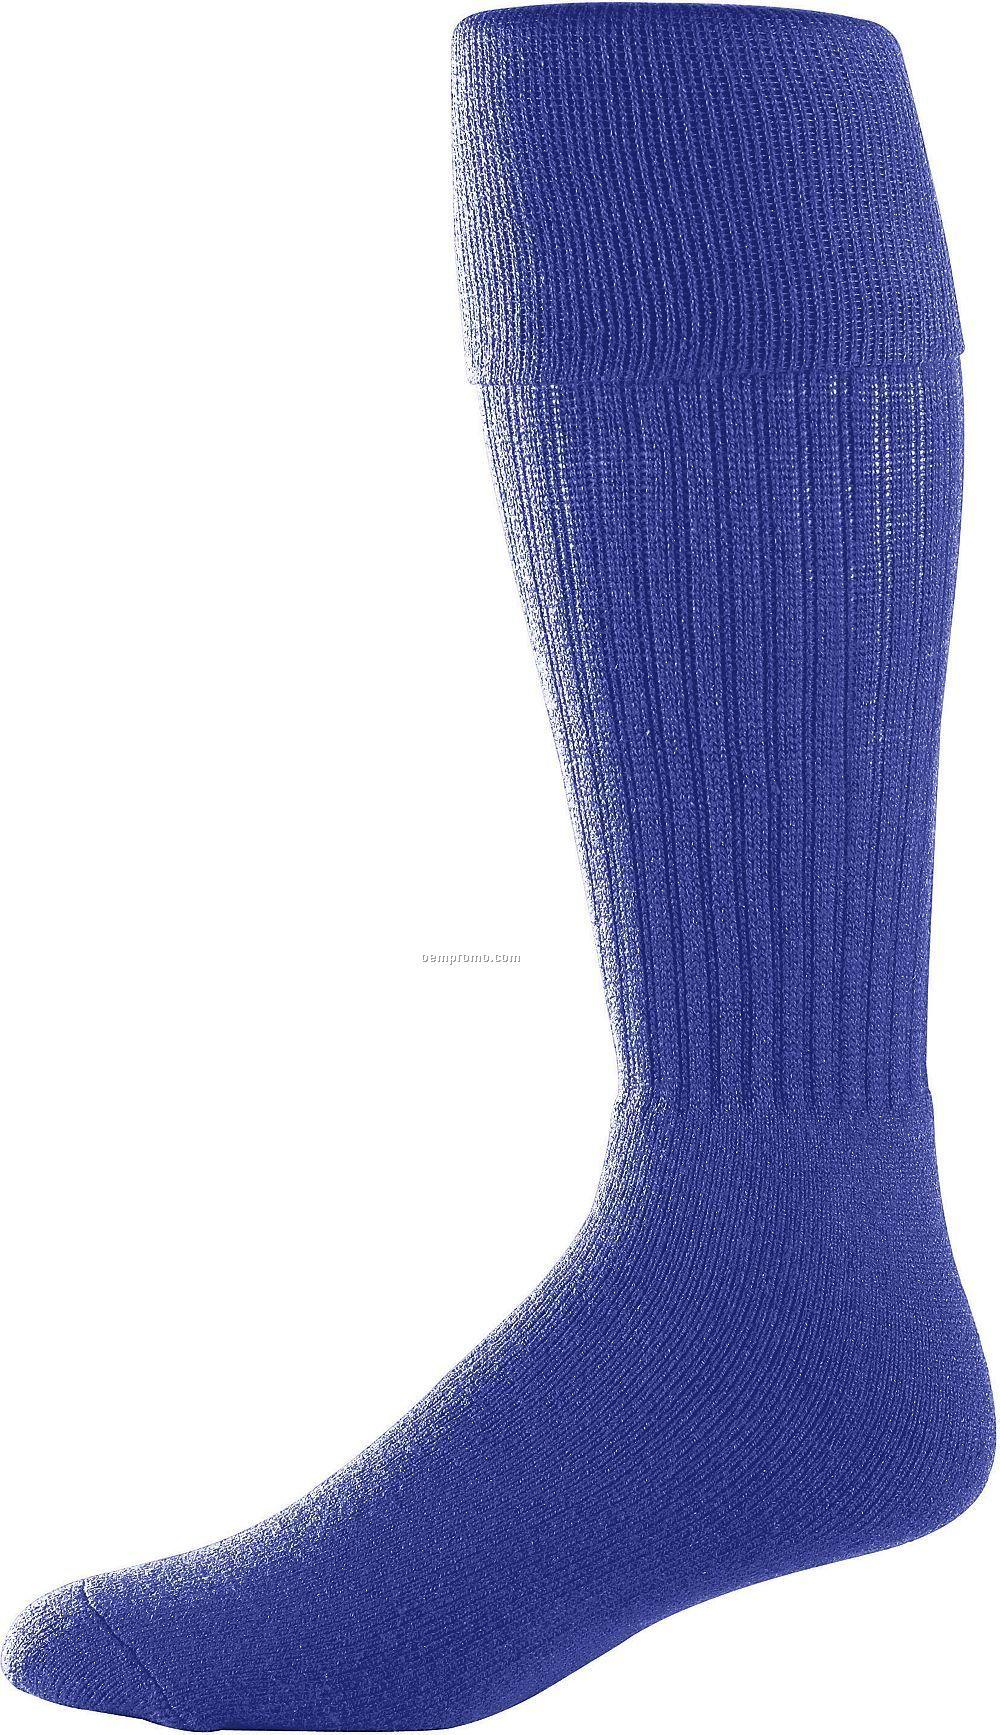 6031 Youth Soccer Sock